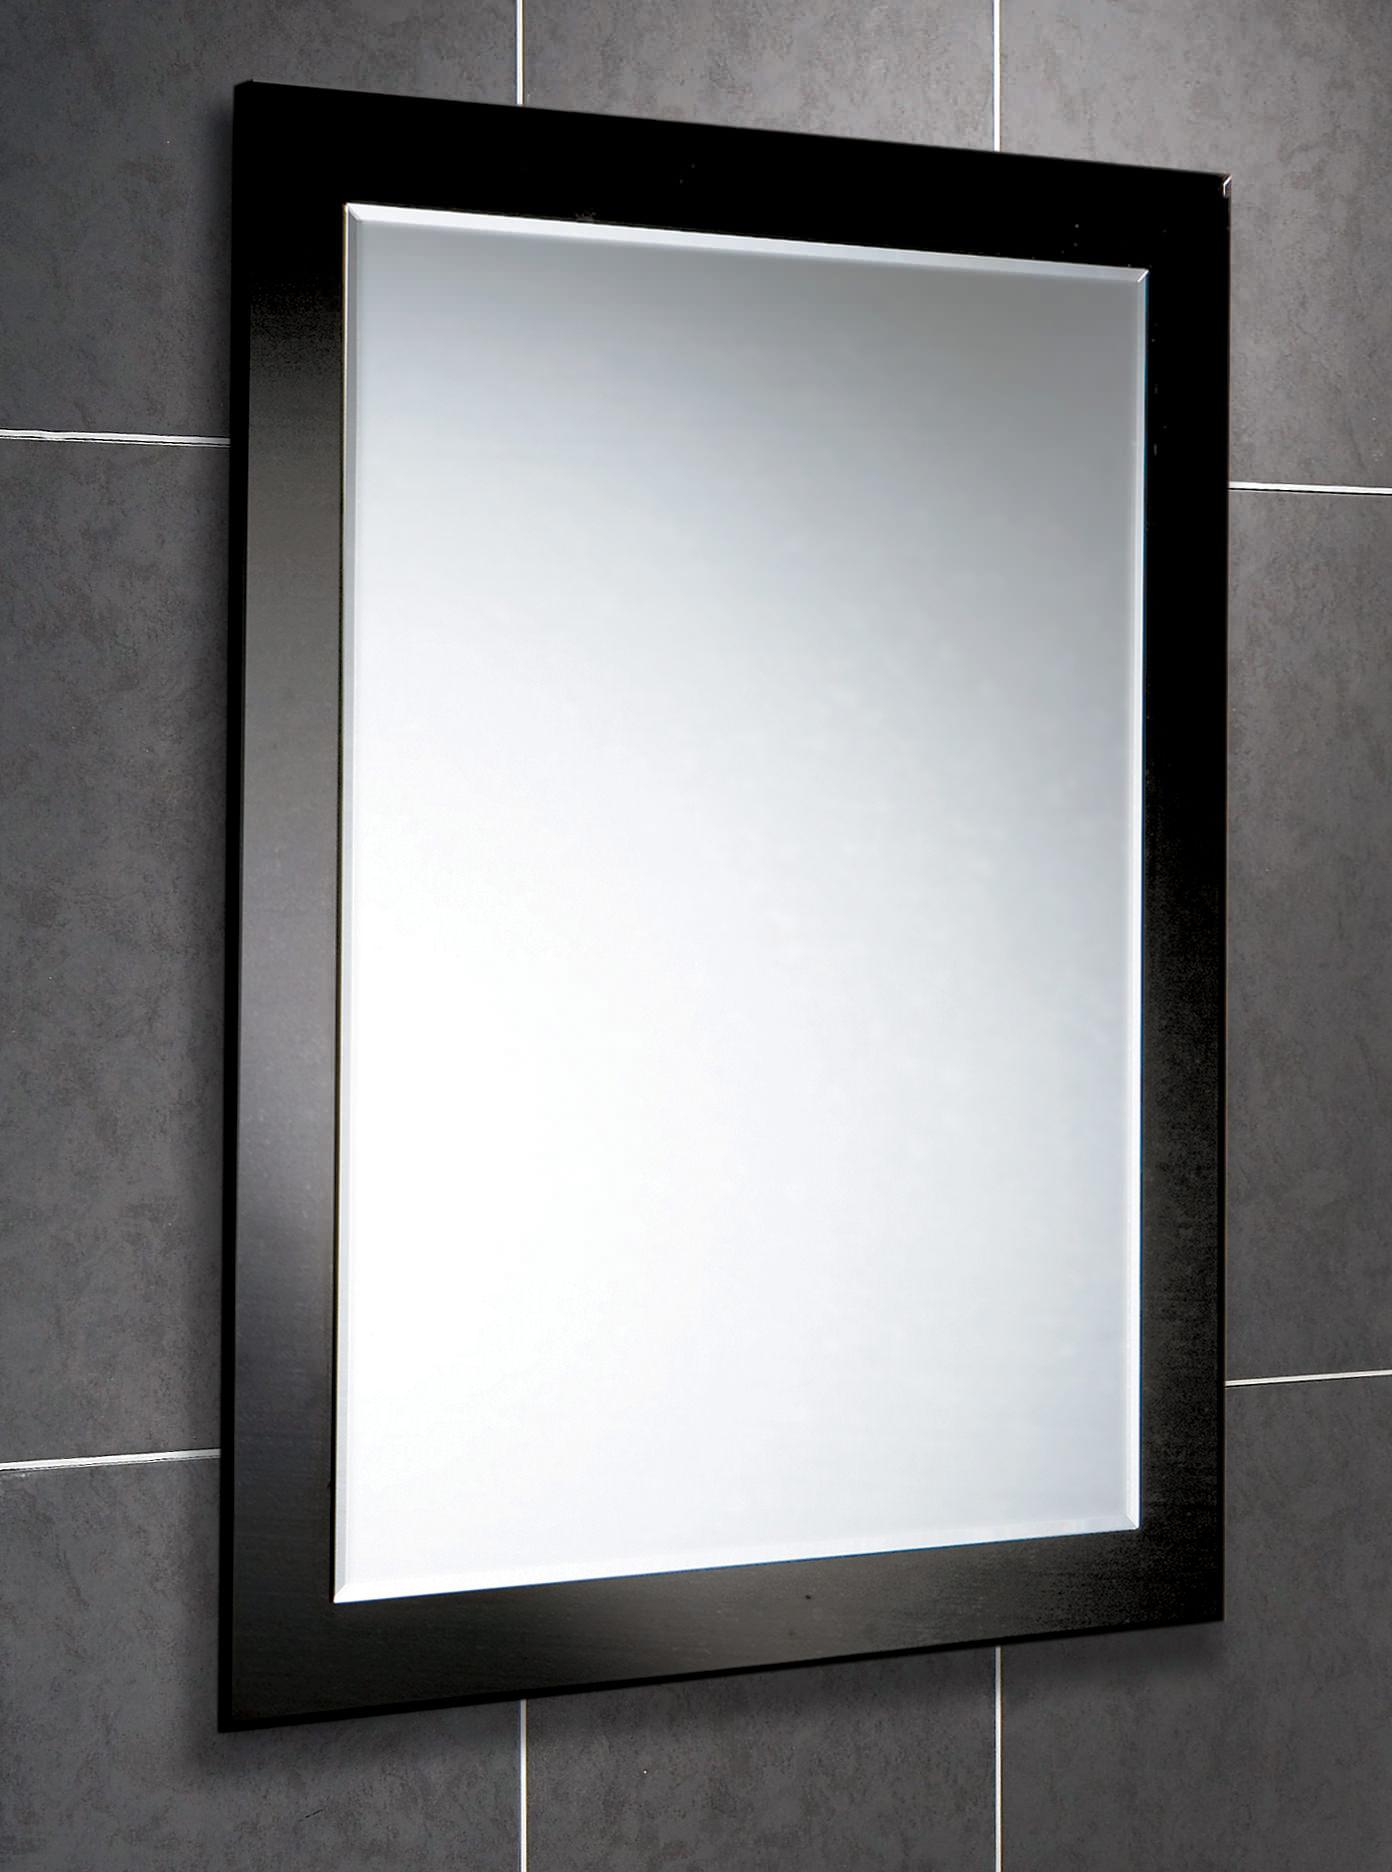 Large rectangular wall mirrors for bathroom - Hib Dalia Rectangular Bevelled Mirror On Black Glass Frame